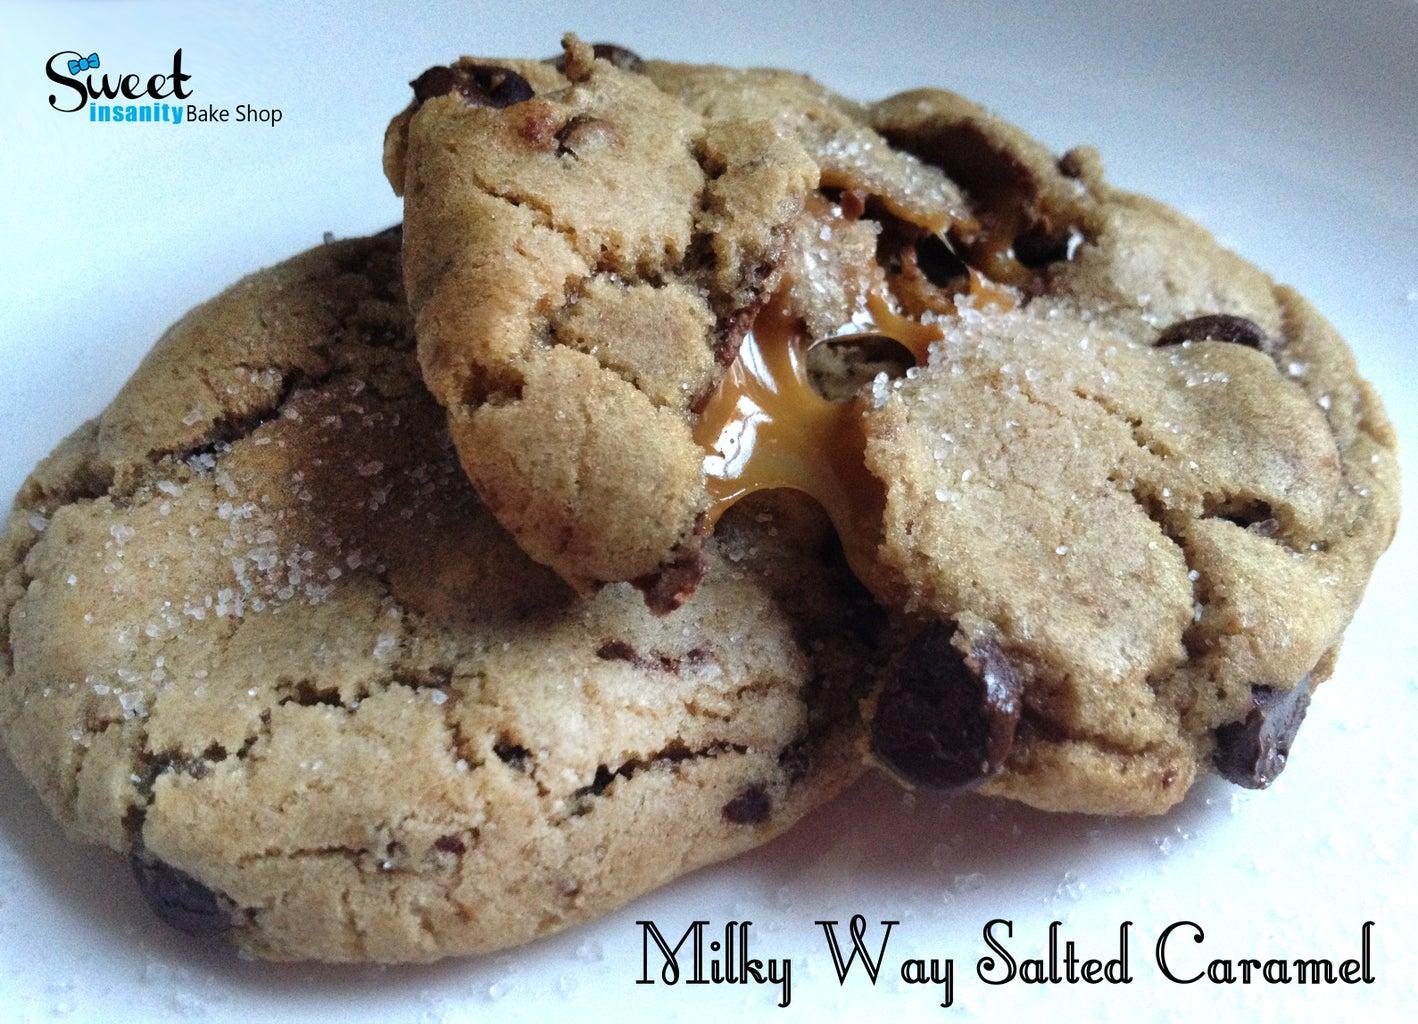 Milky Way Salted Caramel Cookies